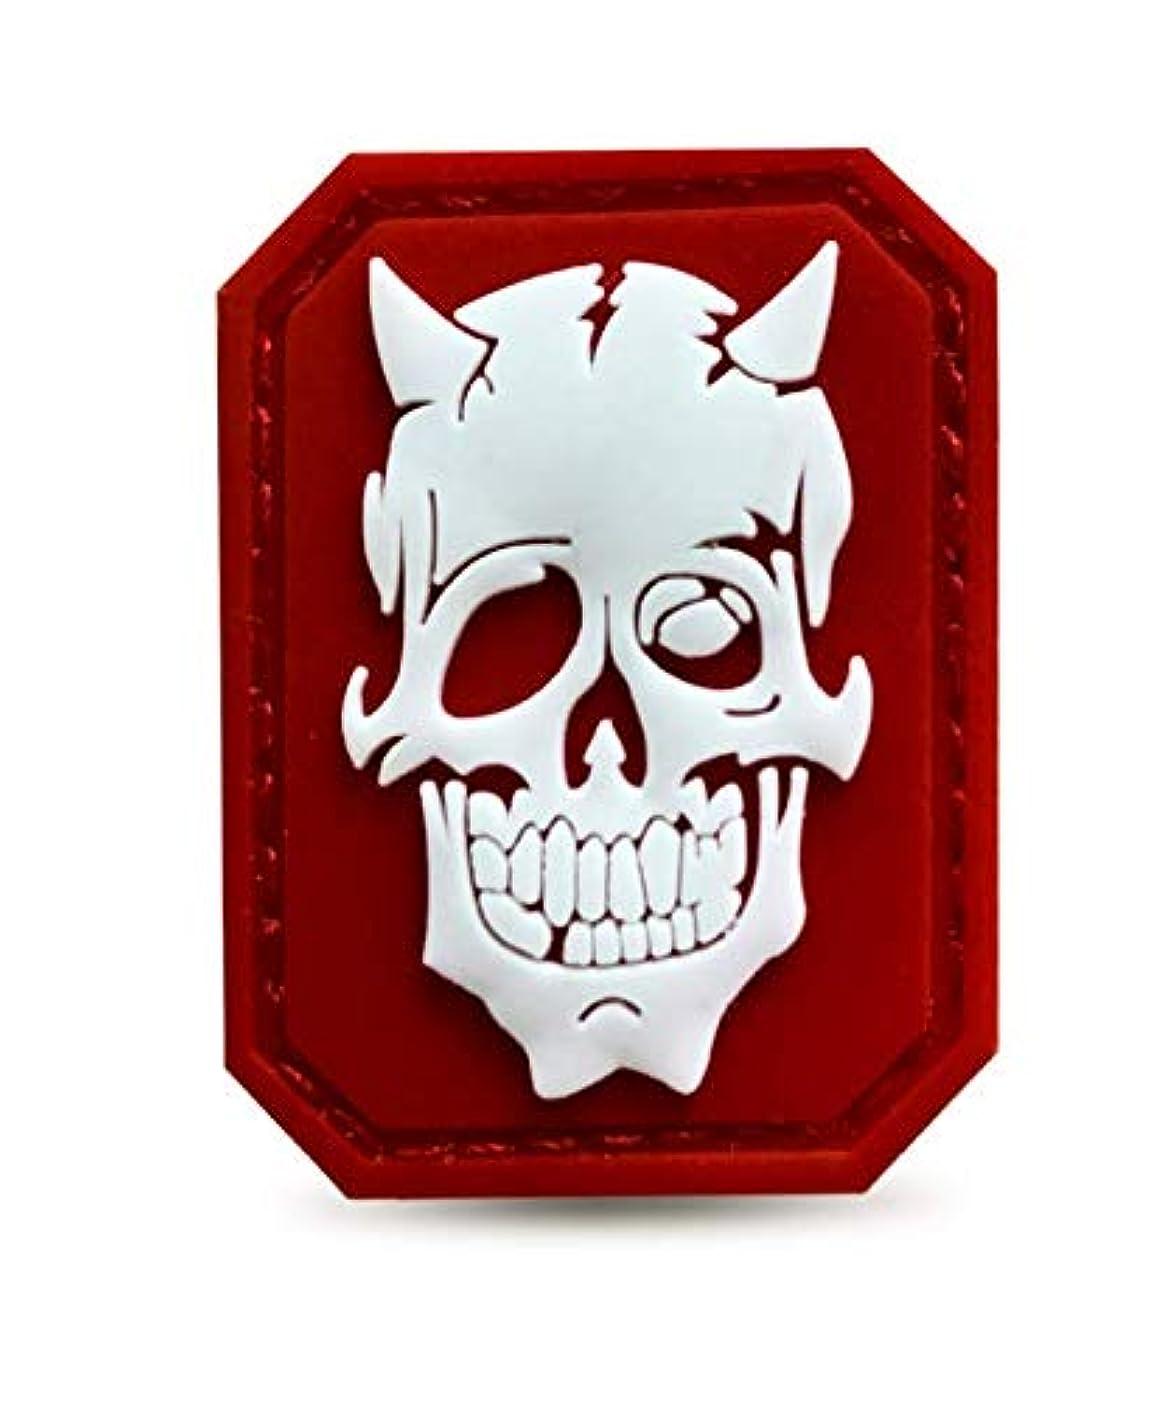 Morton Home Devil Skull PVC Morale Patch/Luminous Skull Patches (red)